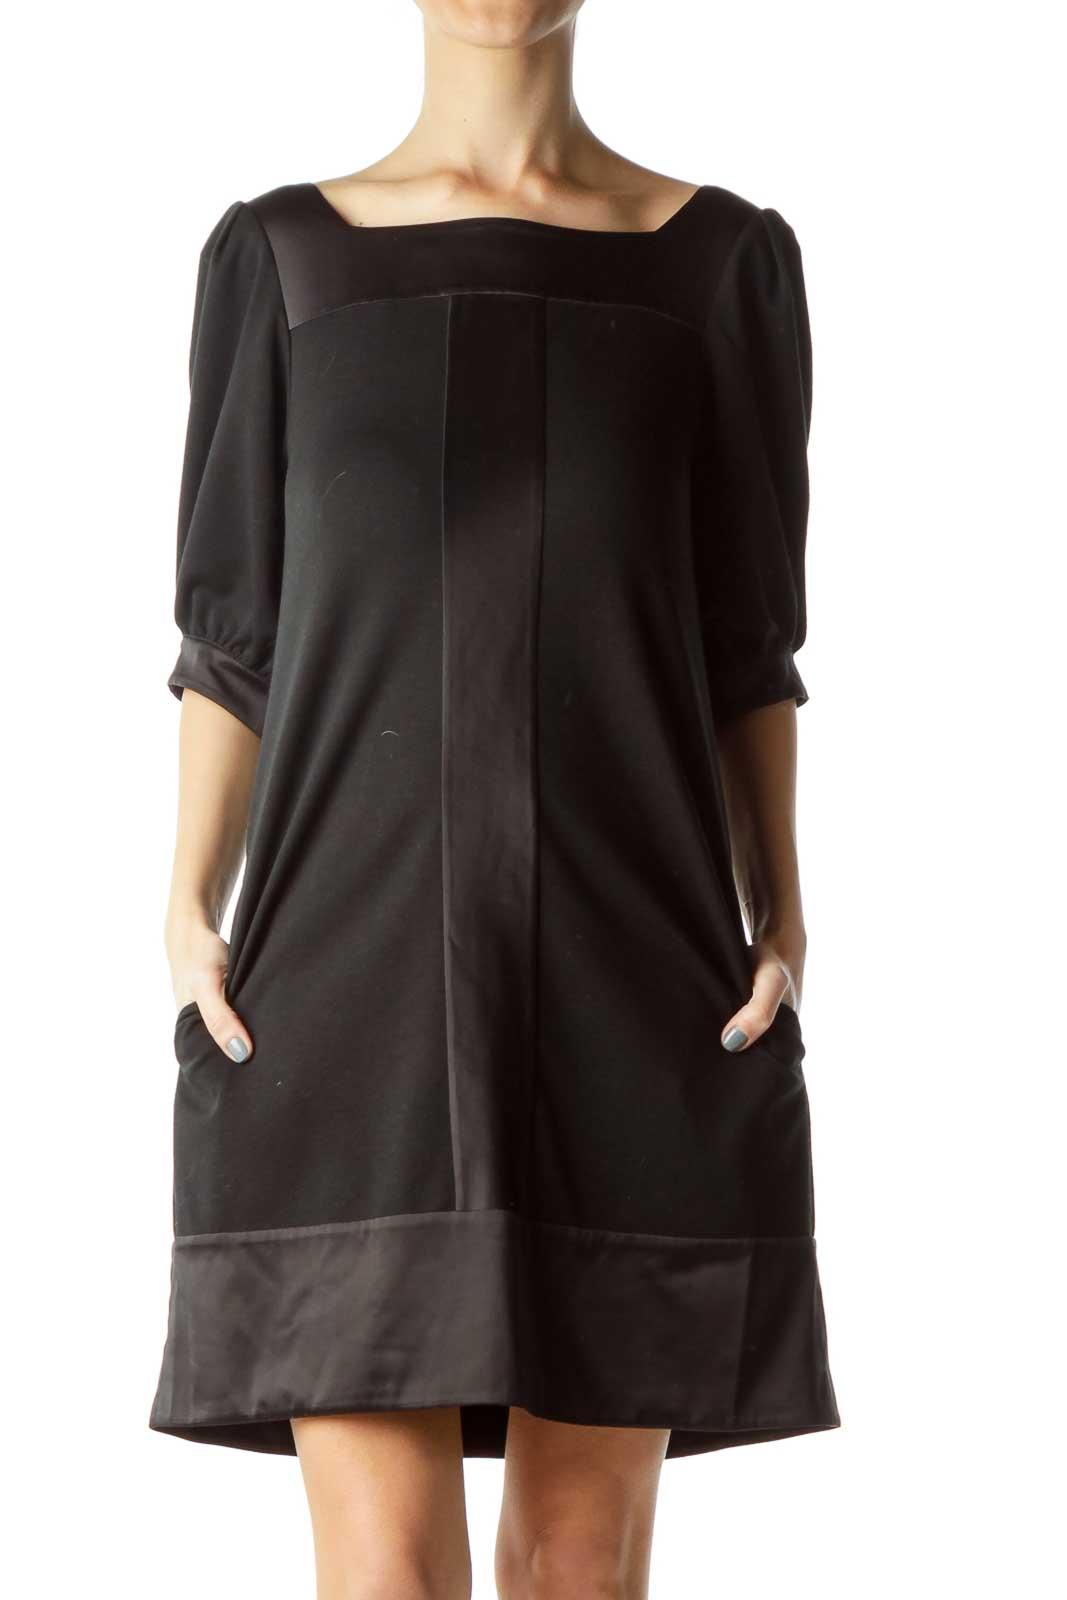 Black Satin Detailed Doll Dress Front